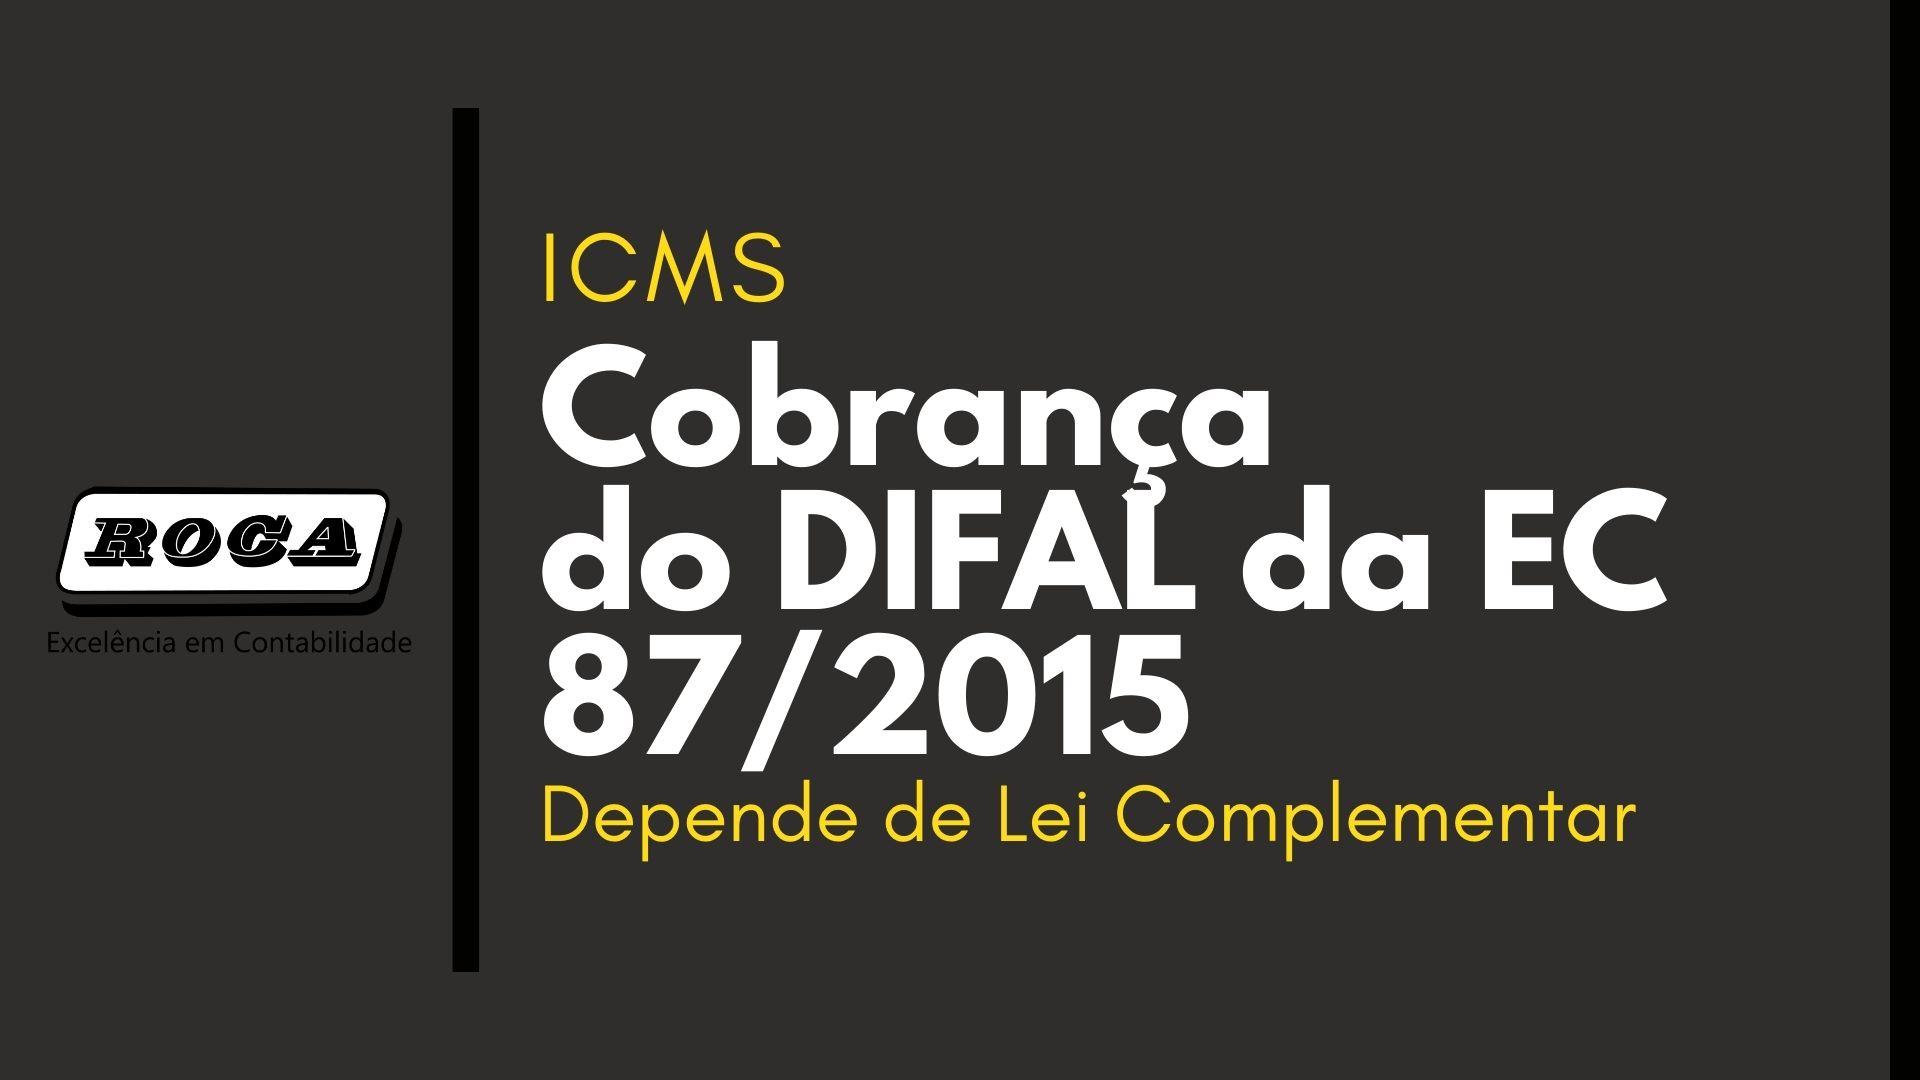 ICMS: Cobrança Do DIFAL Da EC 87/2015, Depende De Lei Complementar